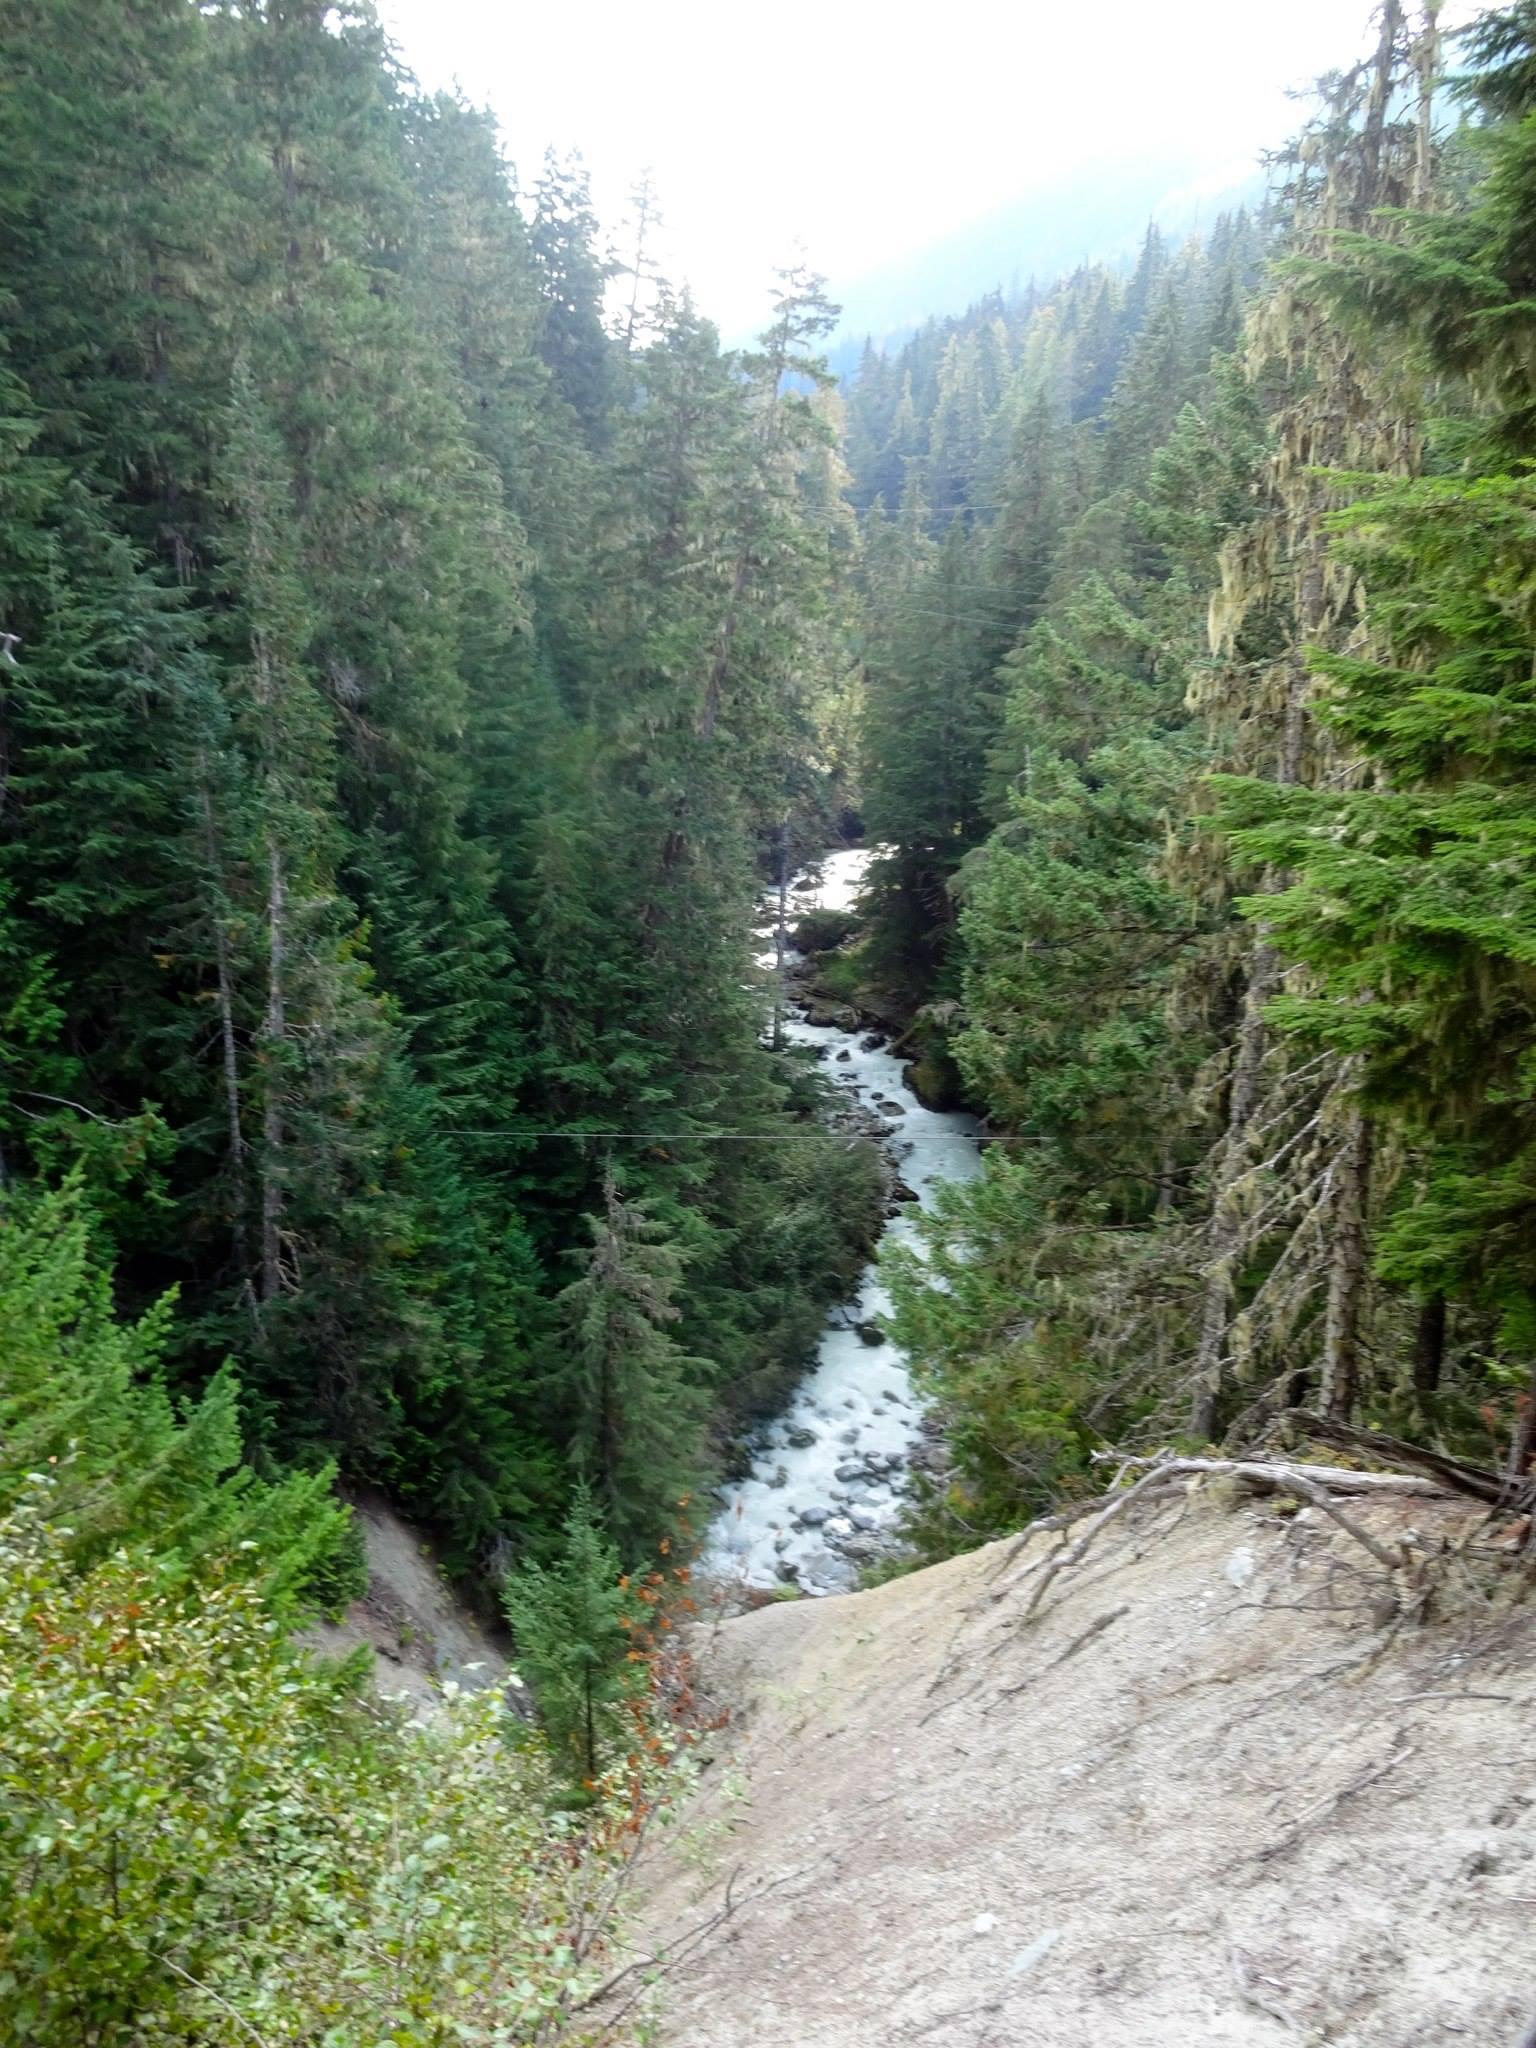 River through forest from suspension bridge